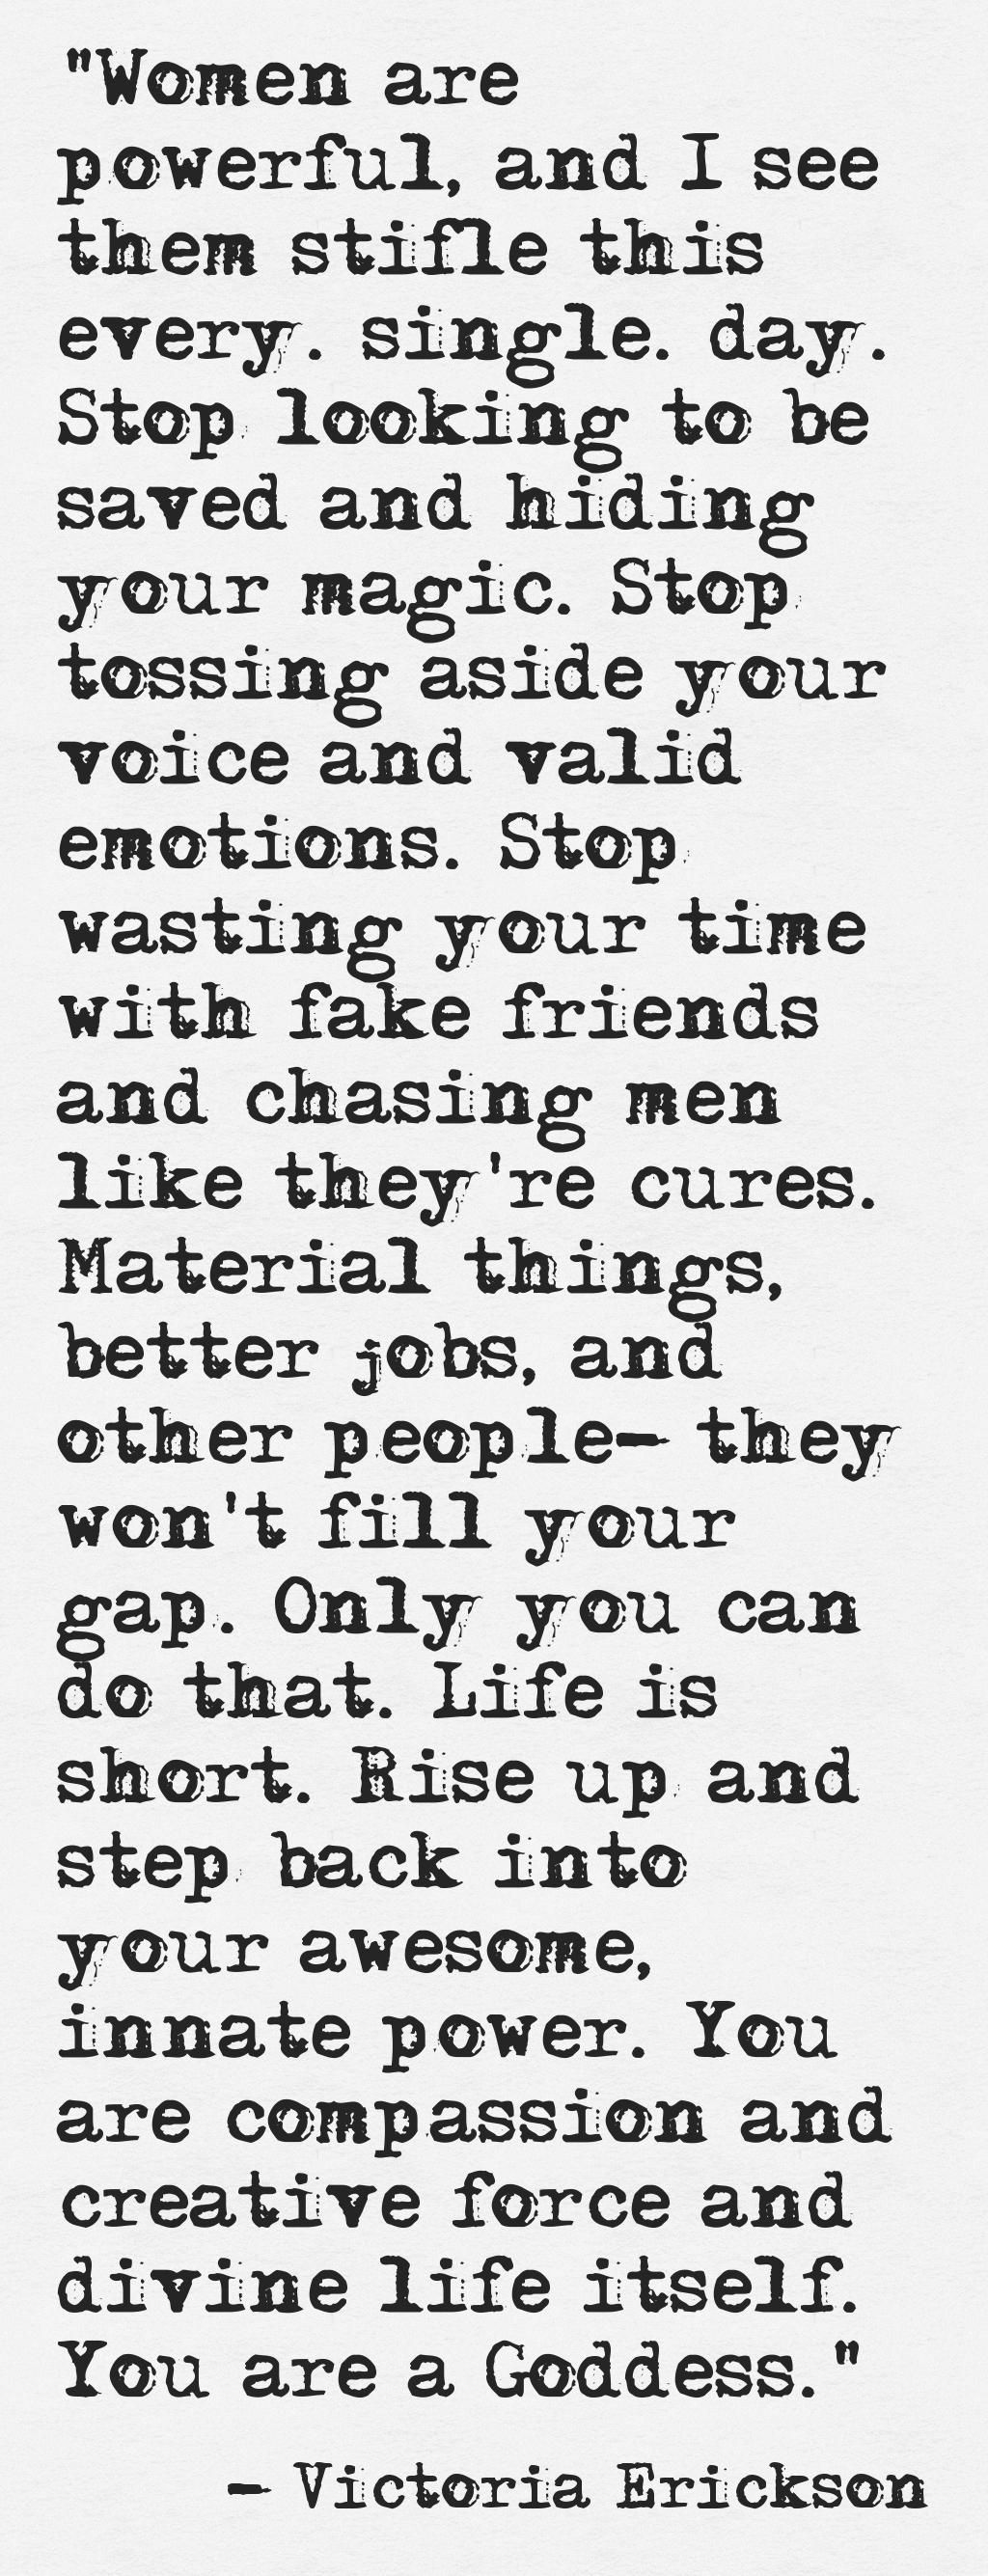 Victoria Erickson Facebook Victoriaericksonwriter Best Inspirational Quotes Inspirational Quotes Words